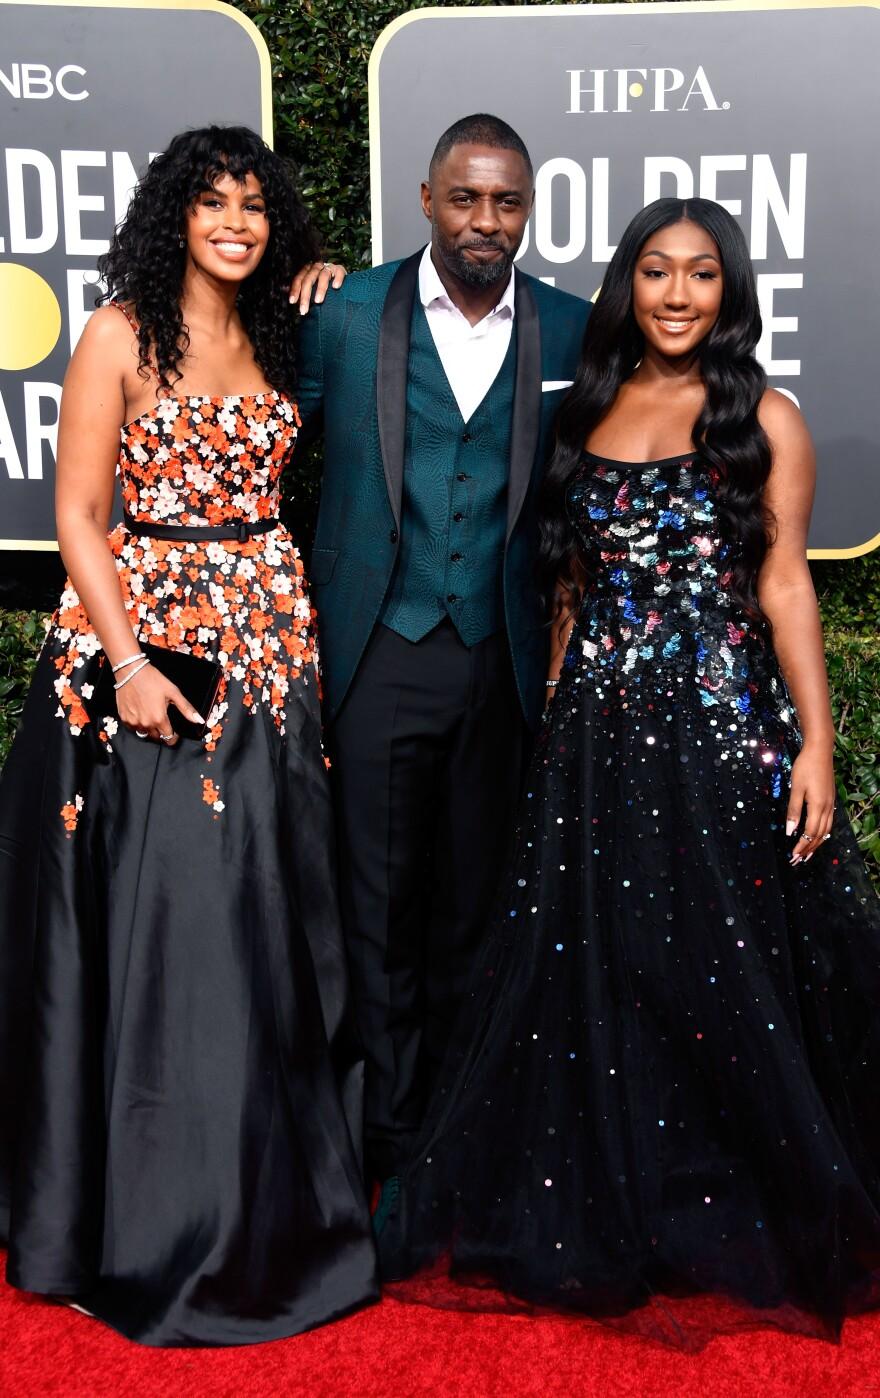 Left to right, Sabrina Dhowre, Idris Elba, and Isan Elba